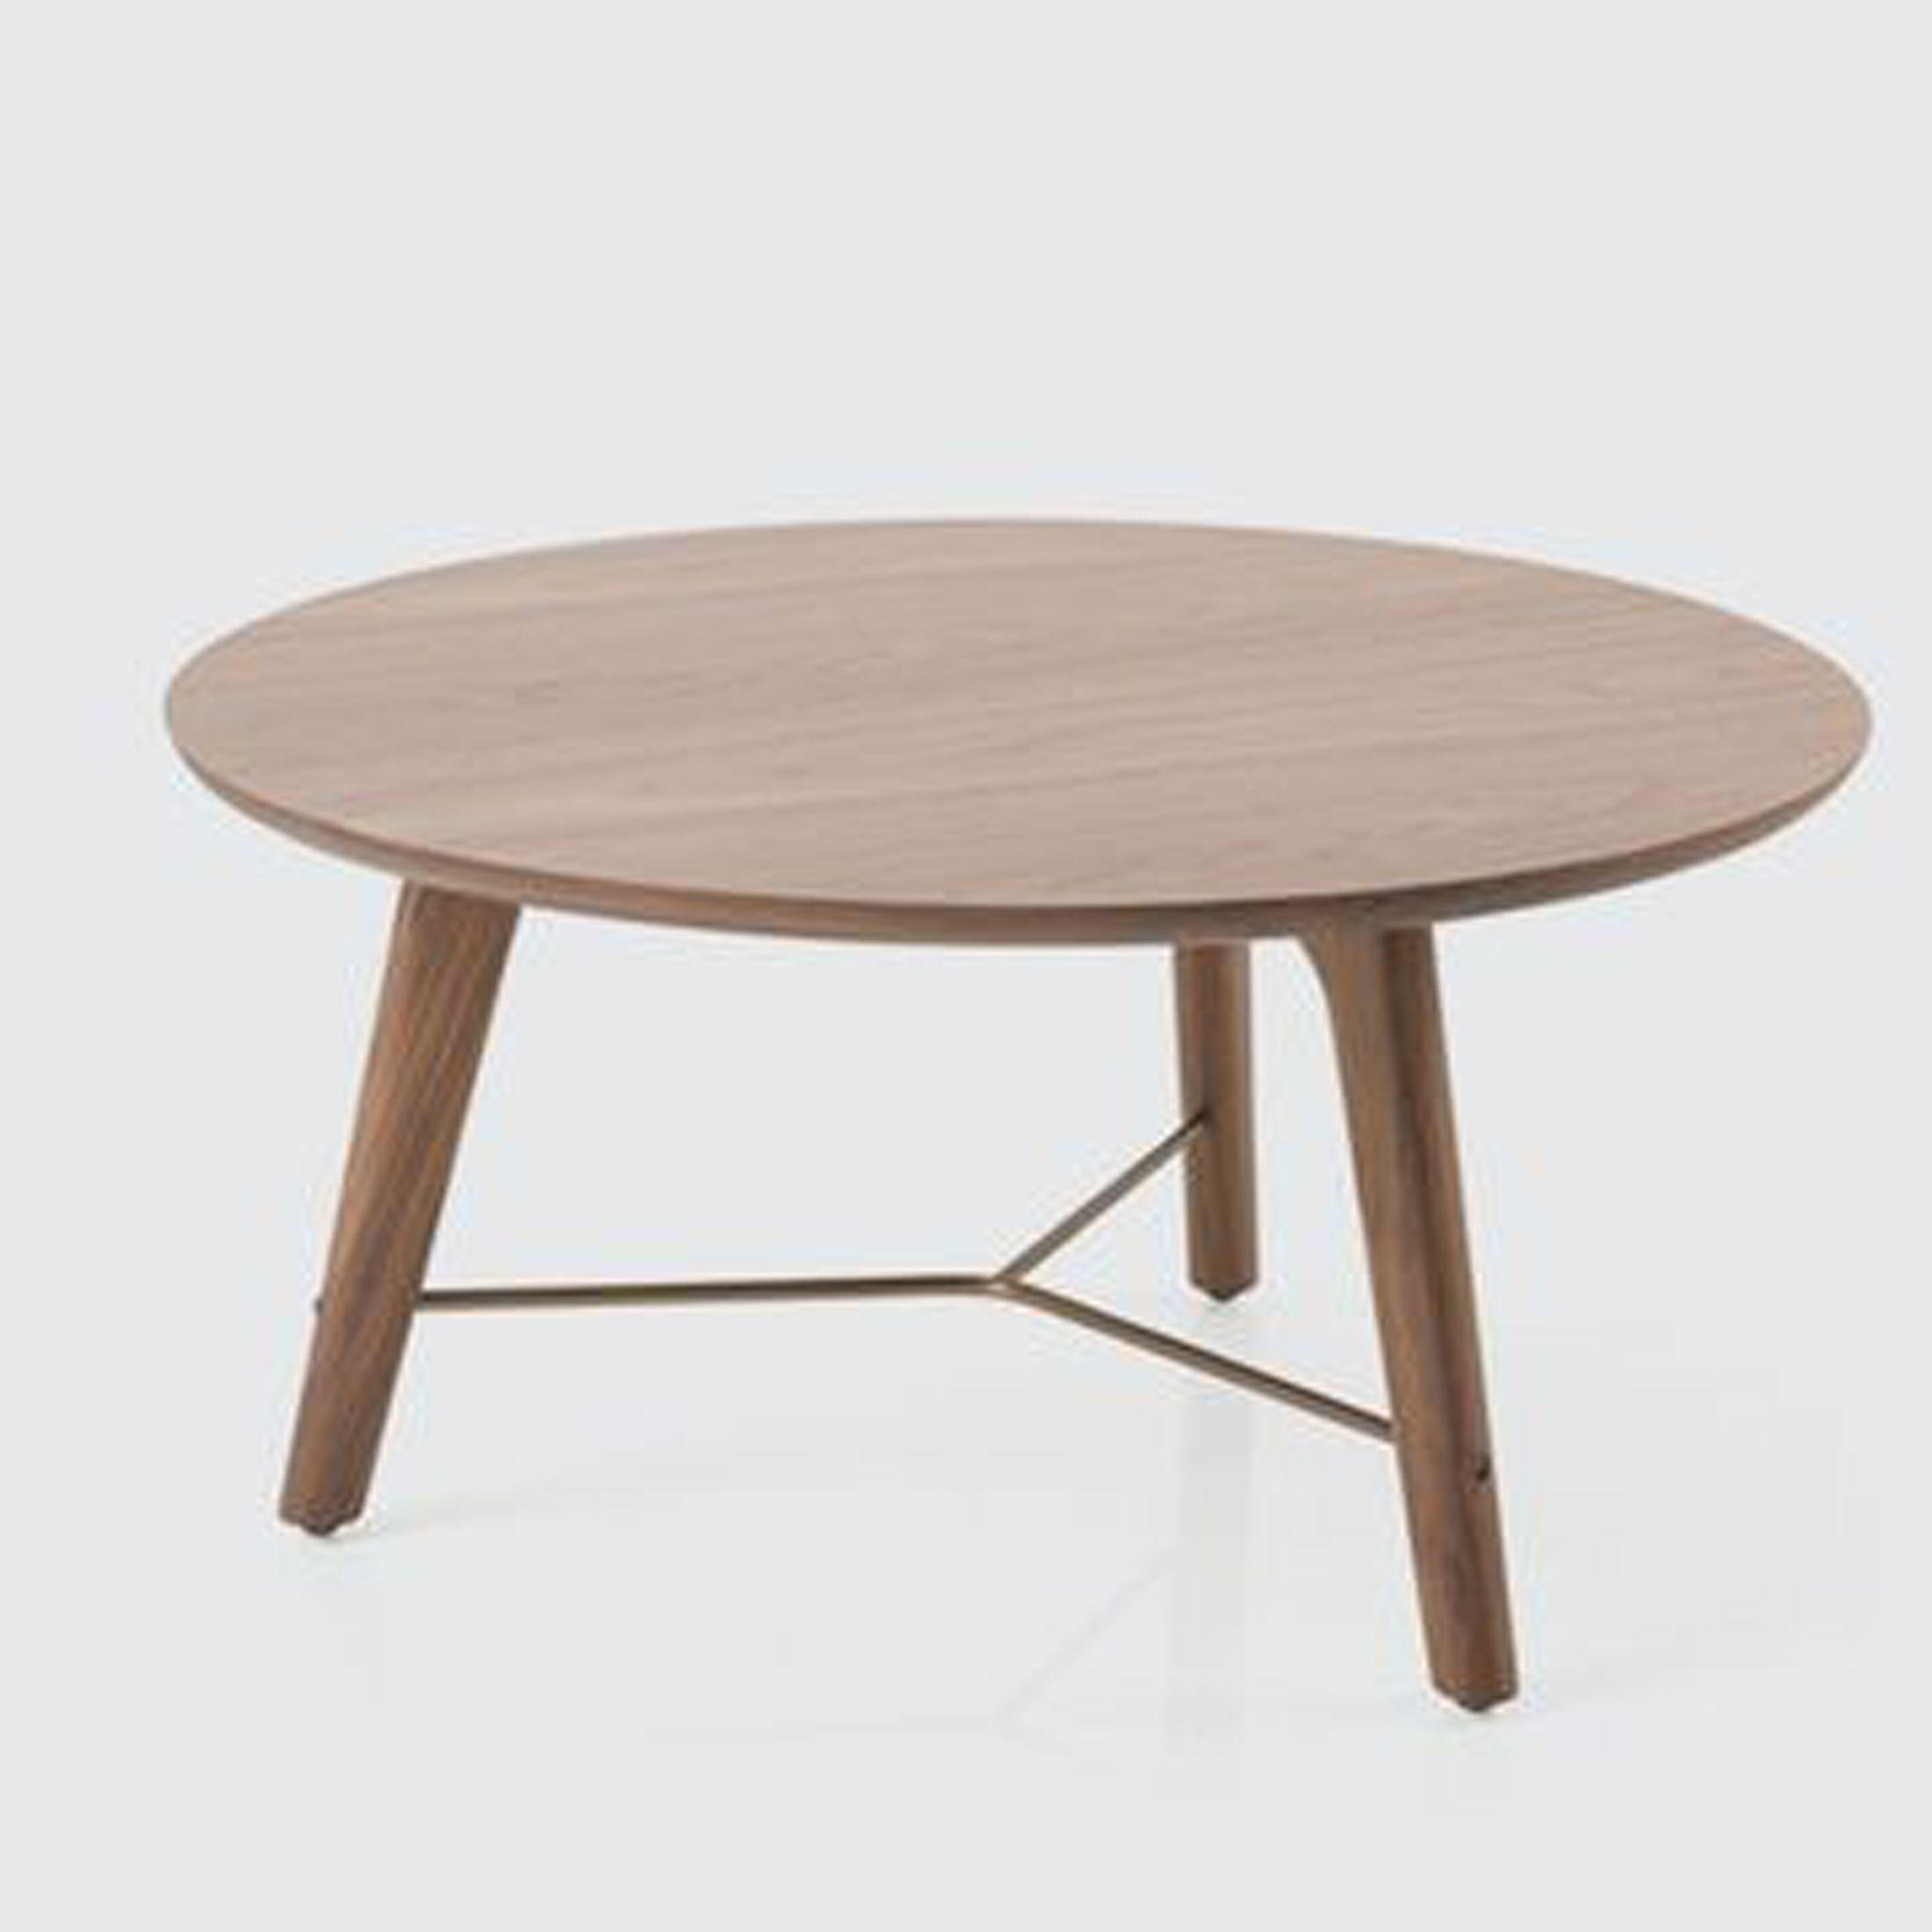 utility-coffee-table.jpg (2200×2200)